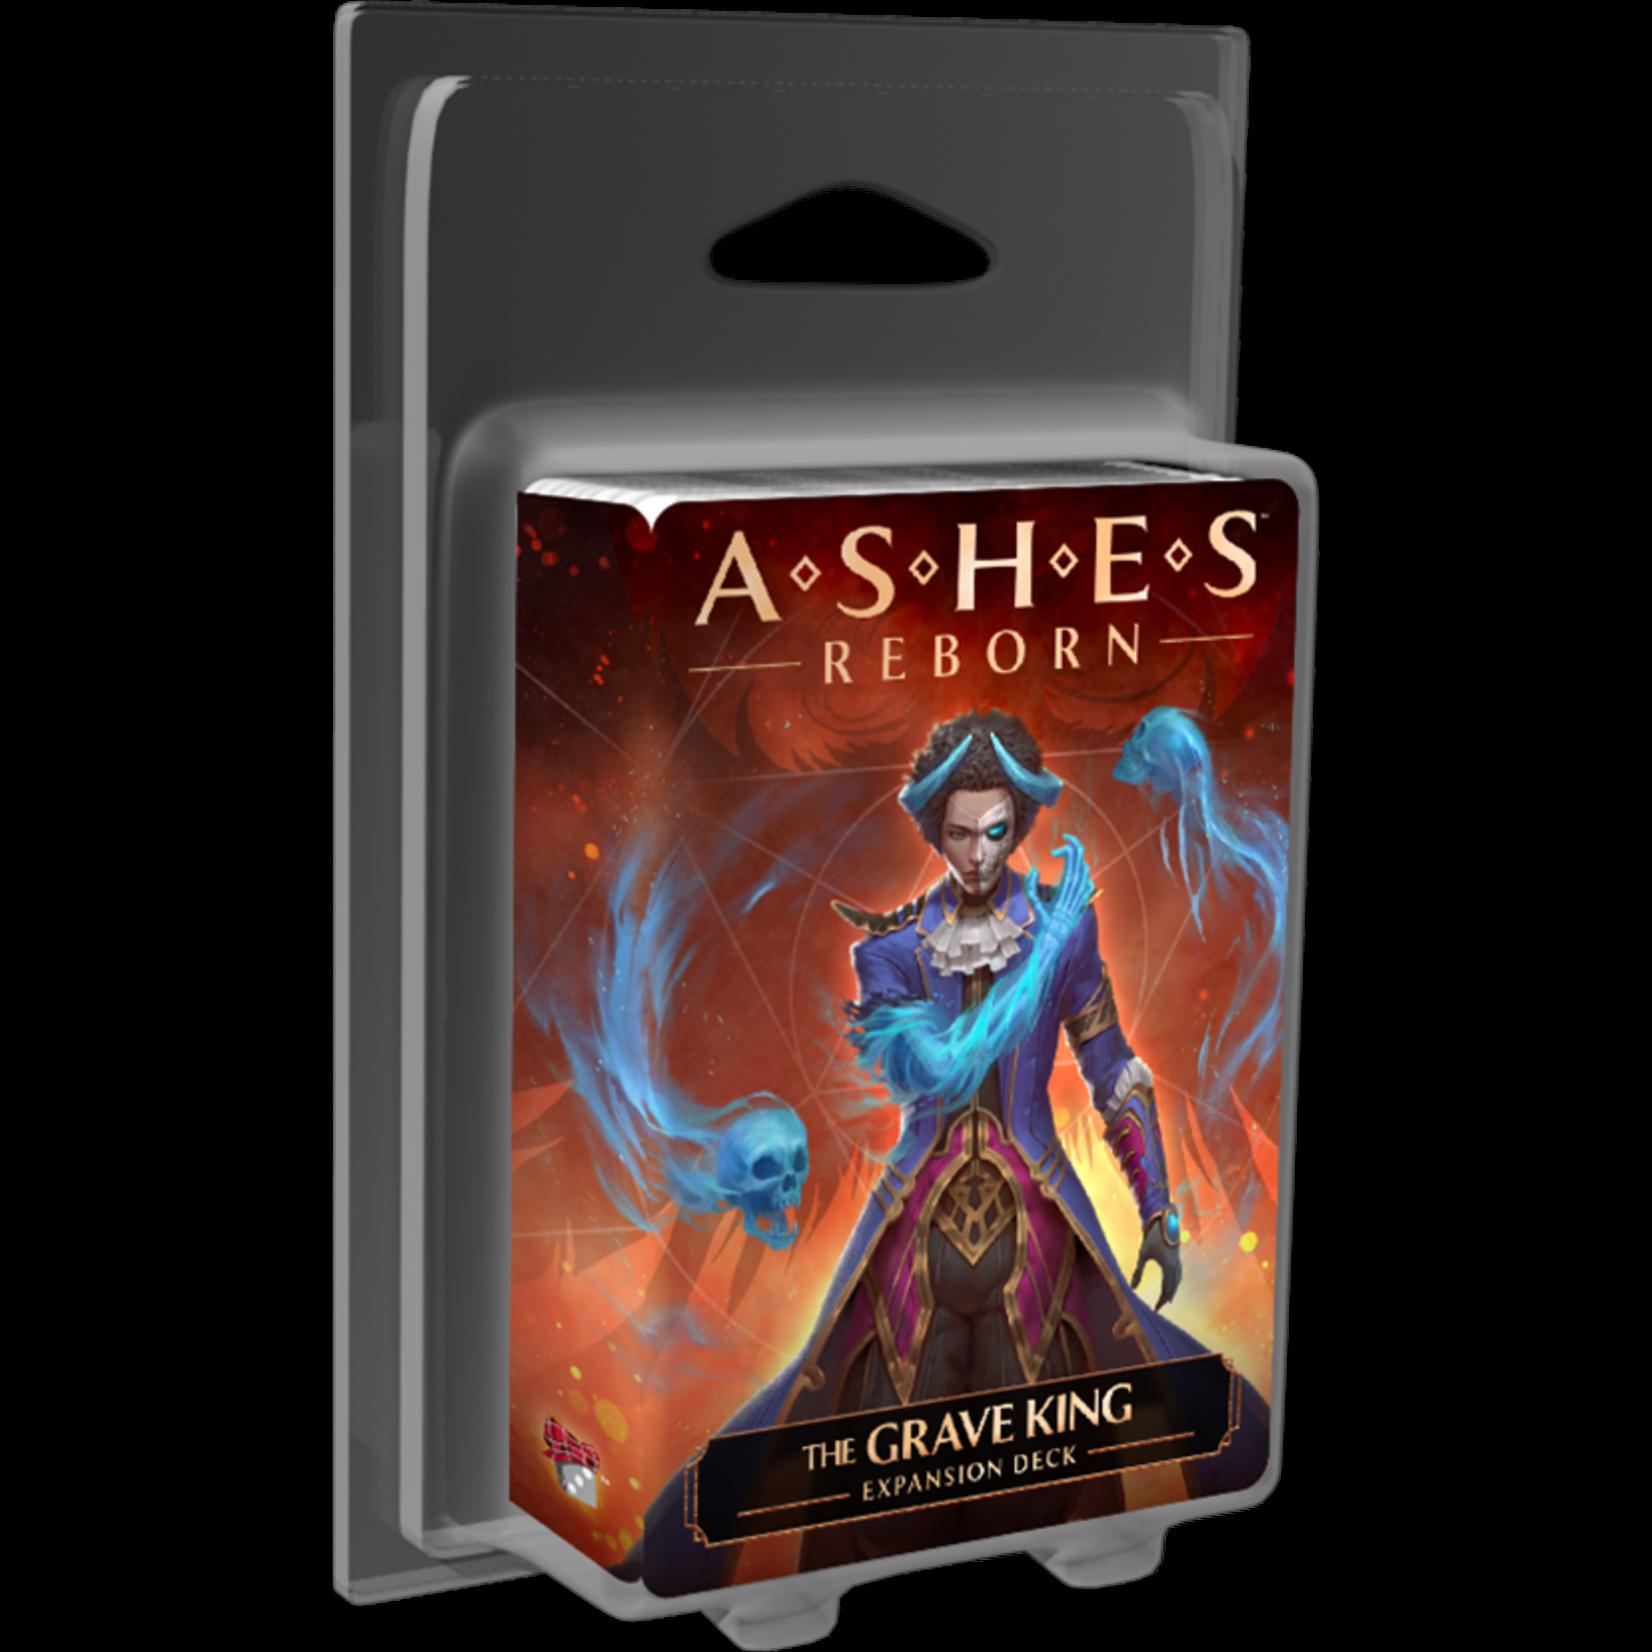 Plaid Hat Games Ashes: Reborn - The Grave King Expansion Deck